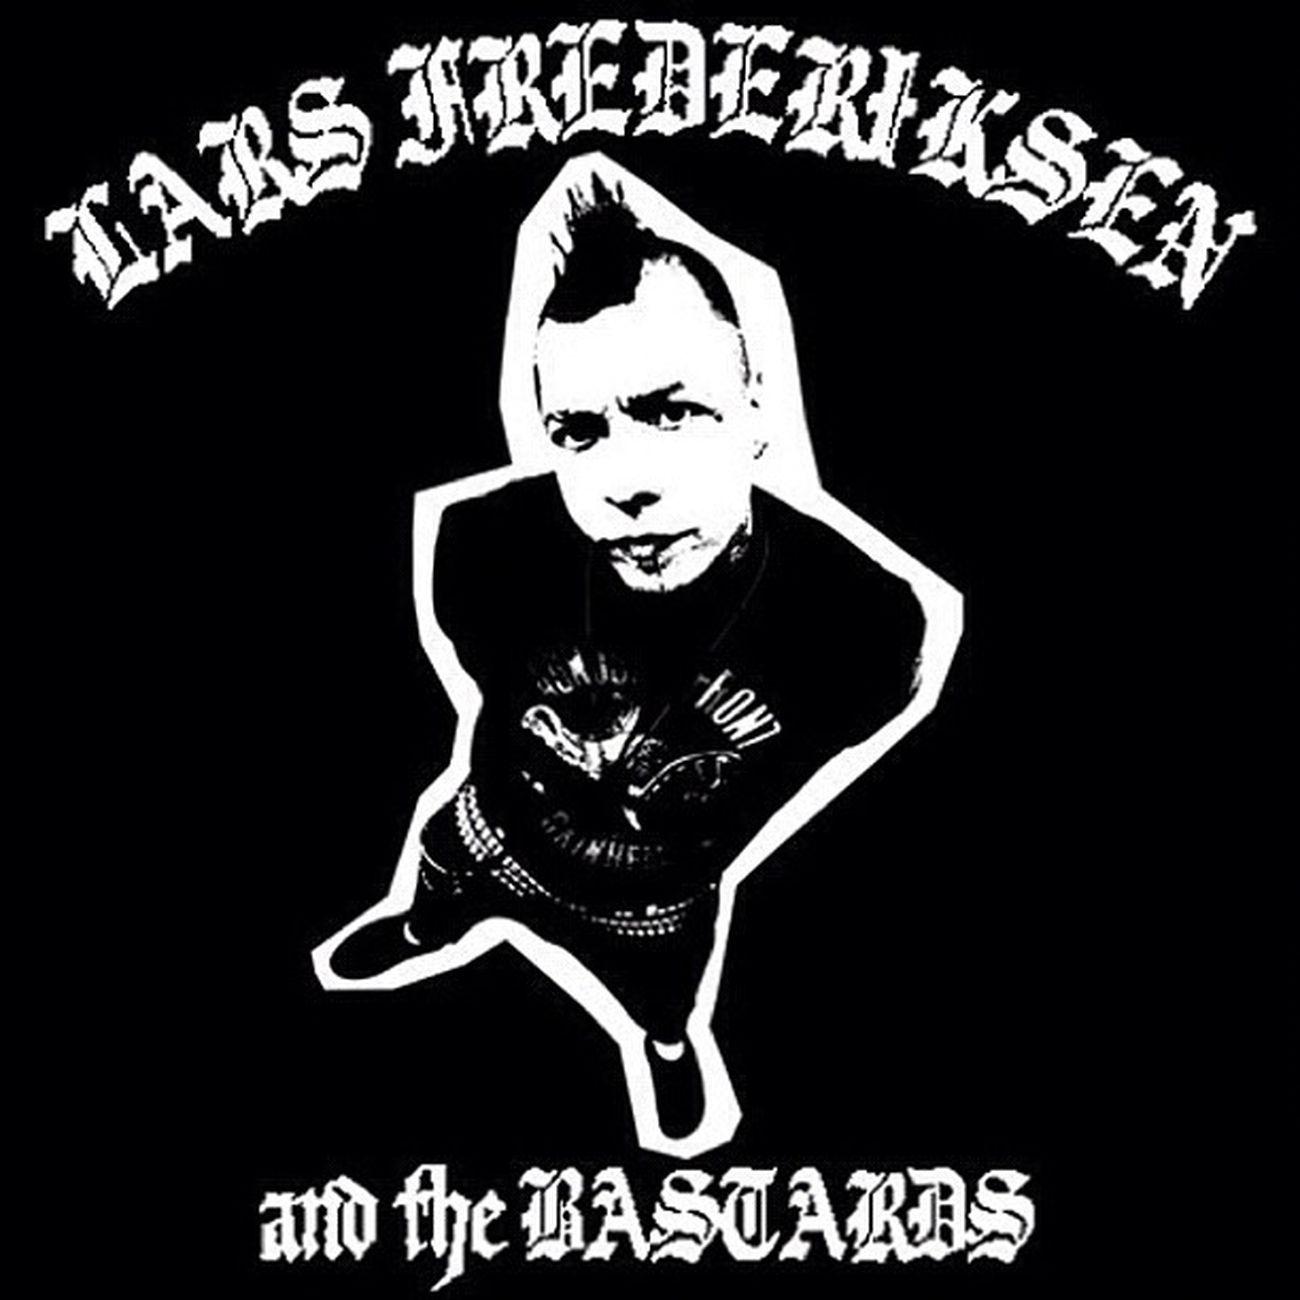 Larsfrederiksen and the Bastards album self titled